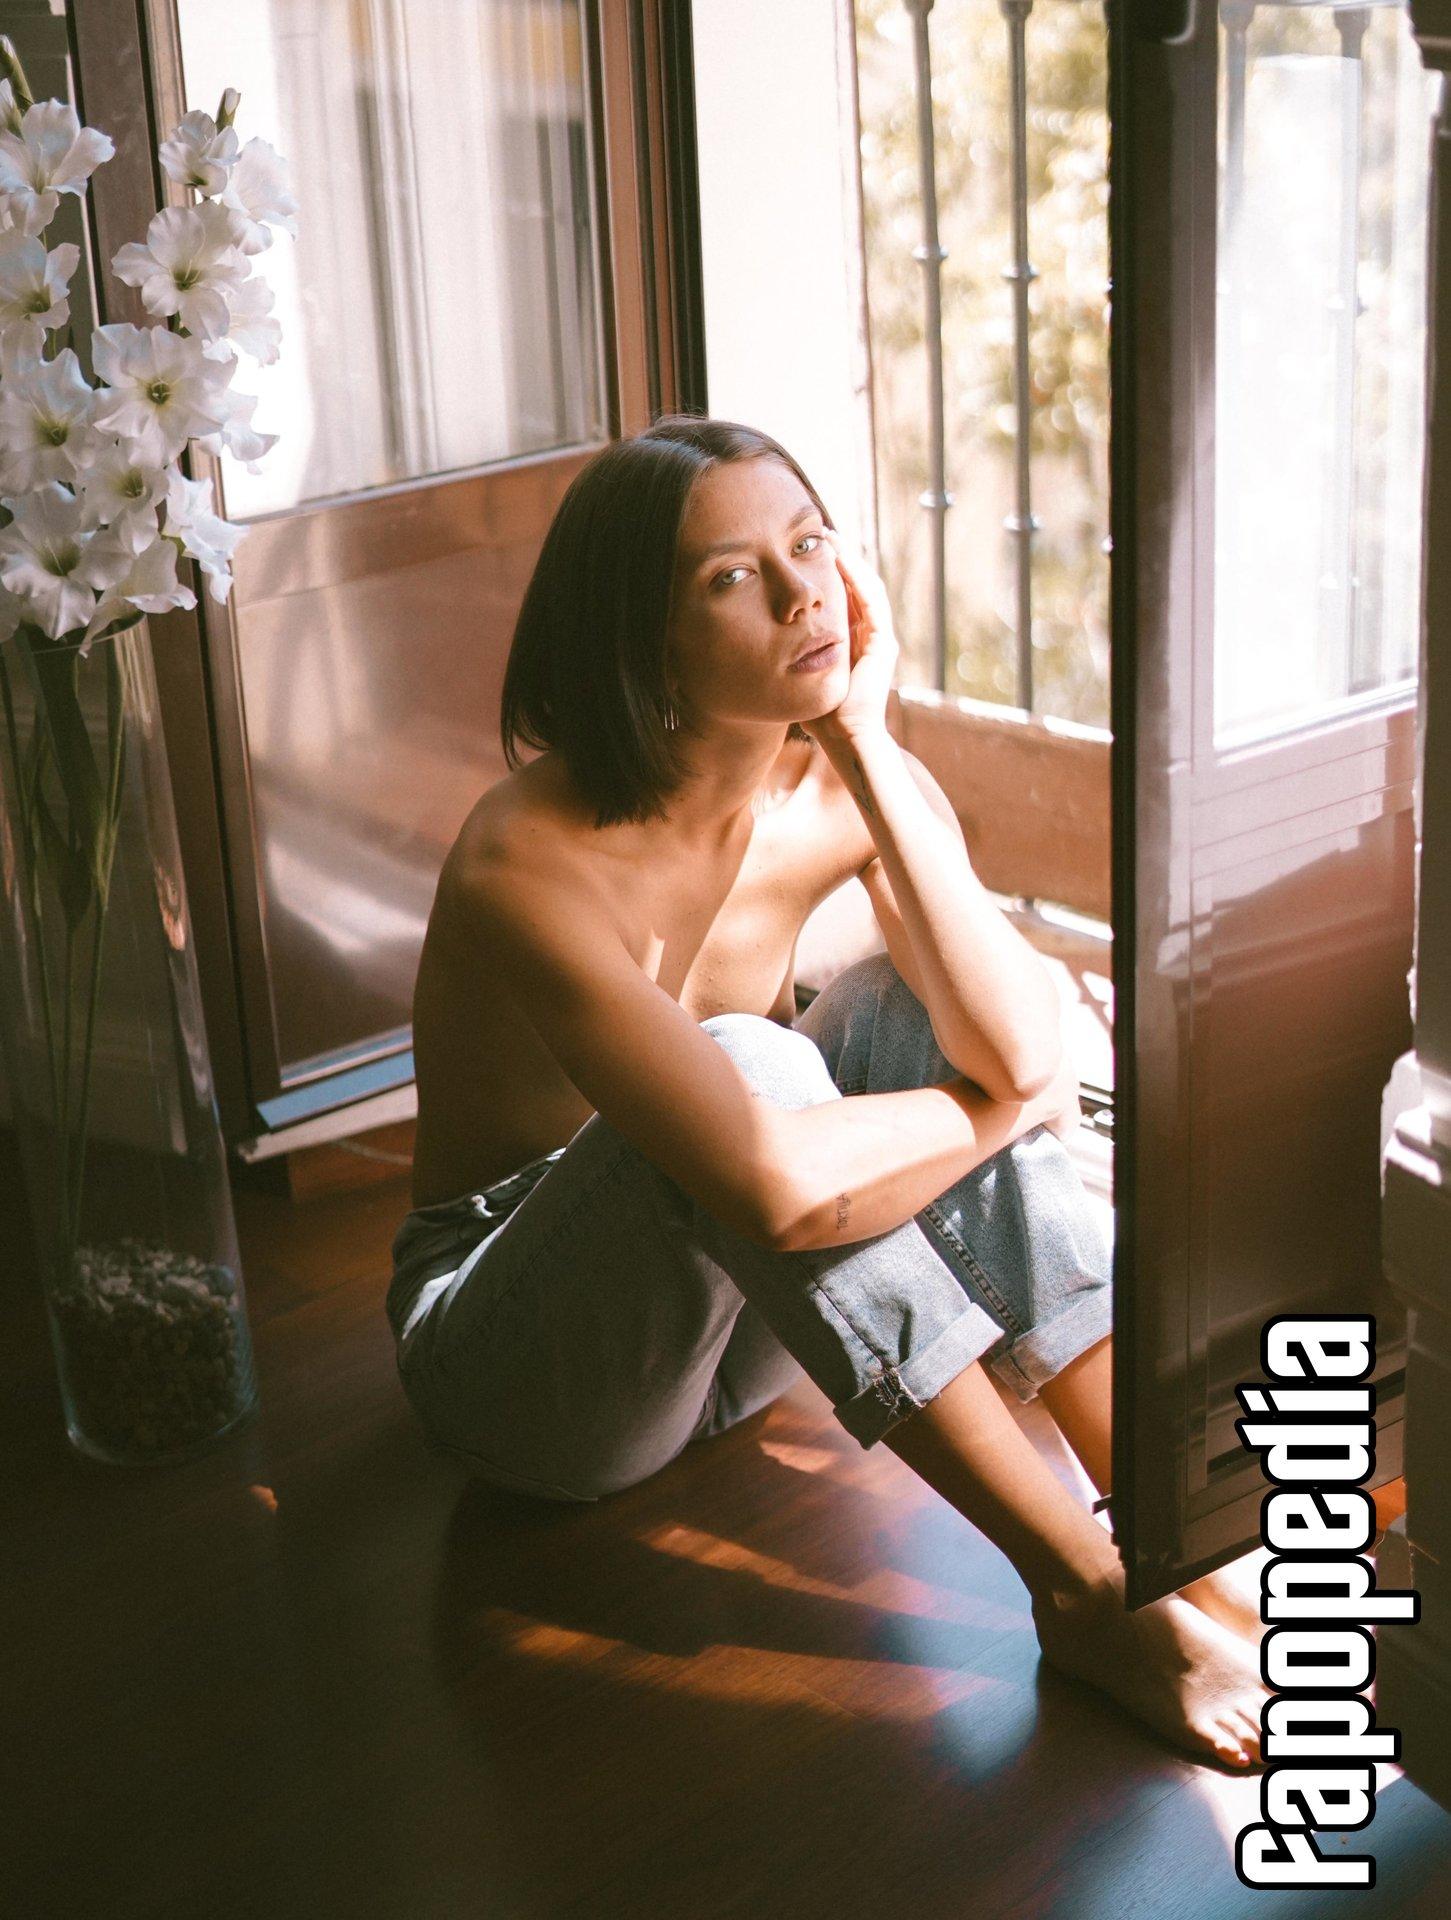 Clementina Aliberti Nude Leaks